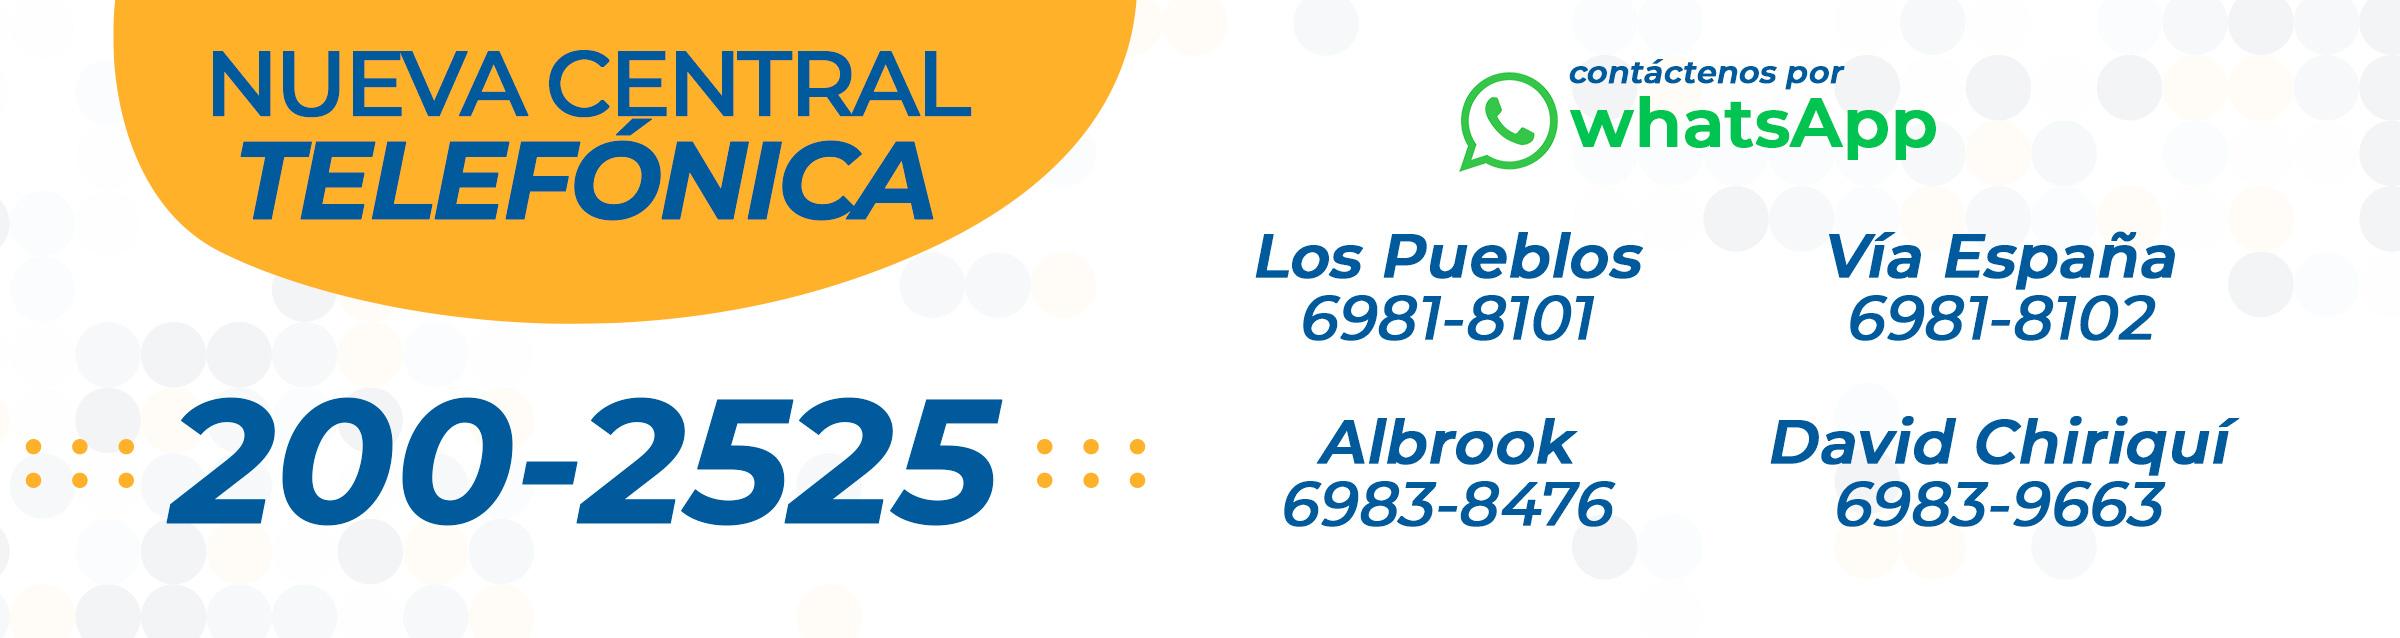 1. Nueva-Central-Telefonica-Banner-Web